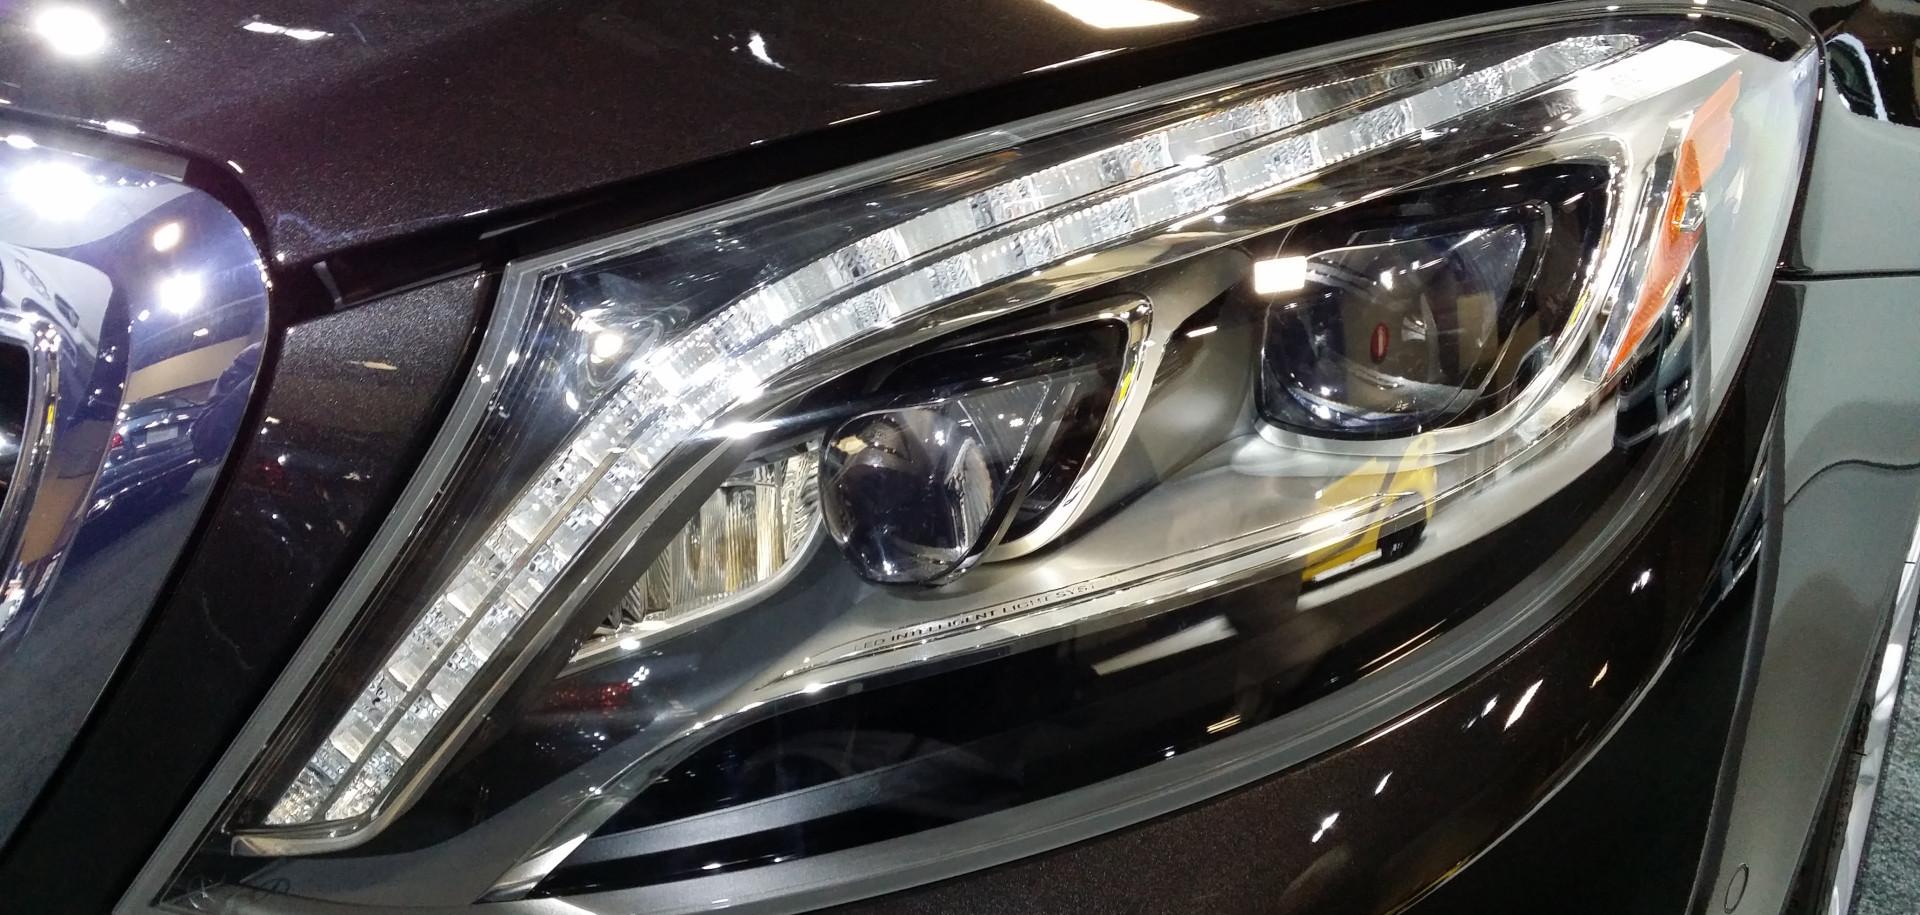 Mercedes_S-Class_LED_Headlight_(W222)